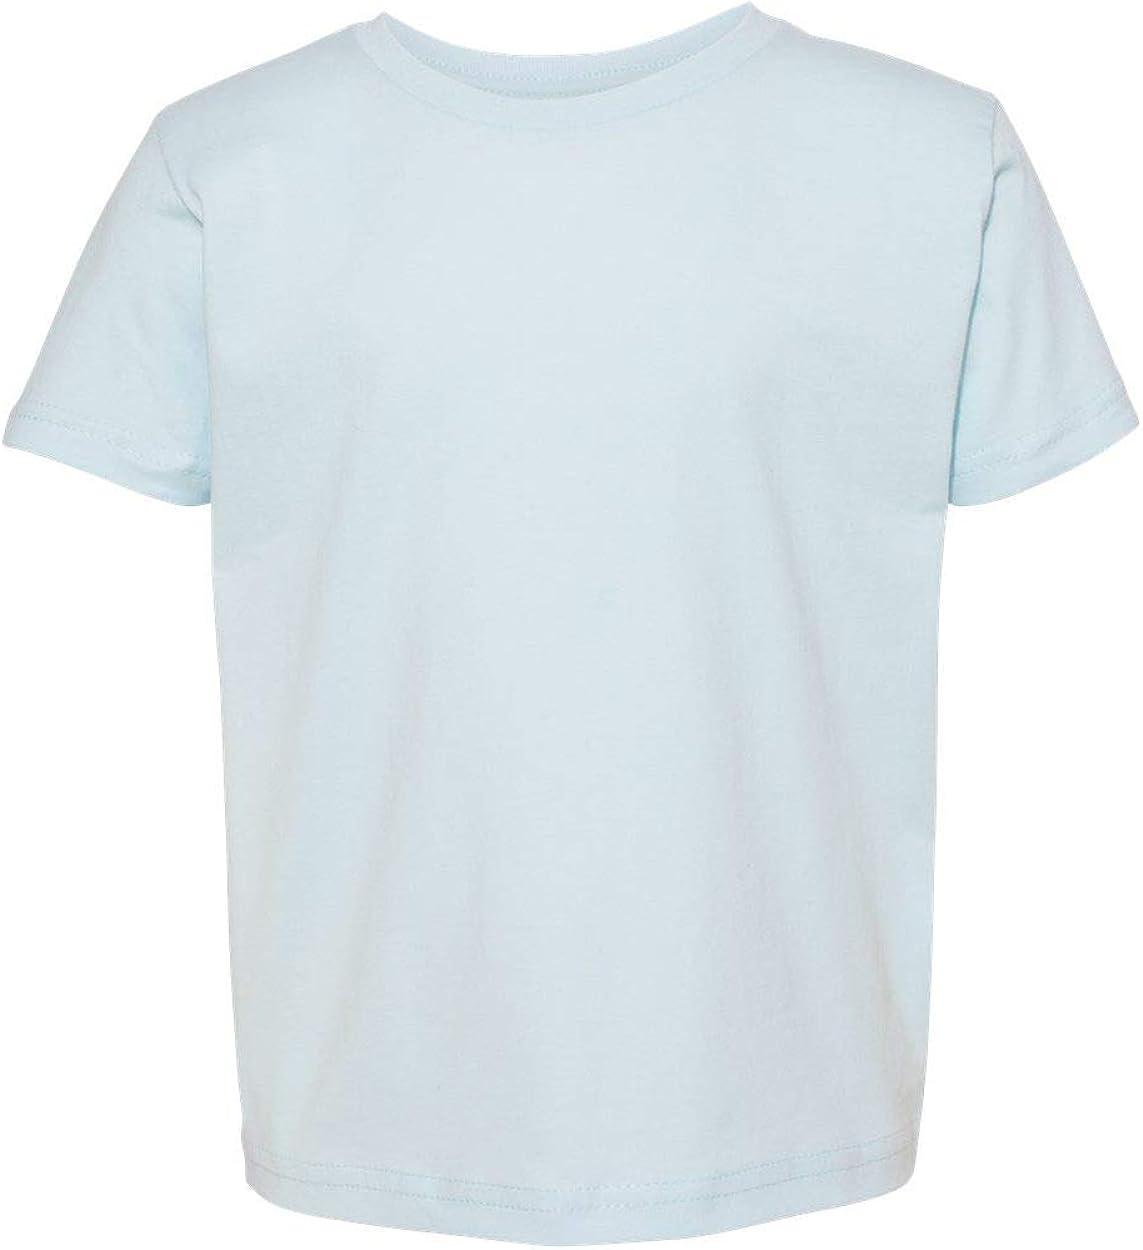 Next Level Baby Boy Cotton T-Shirt, Light Blue, 3T